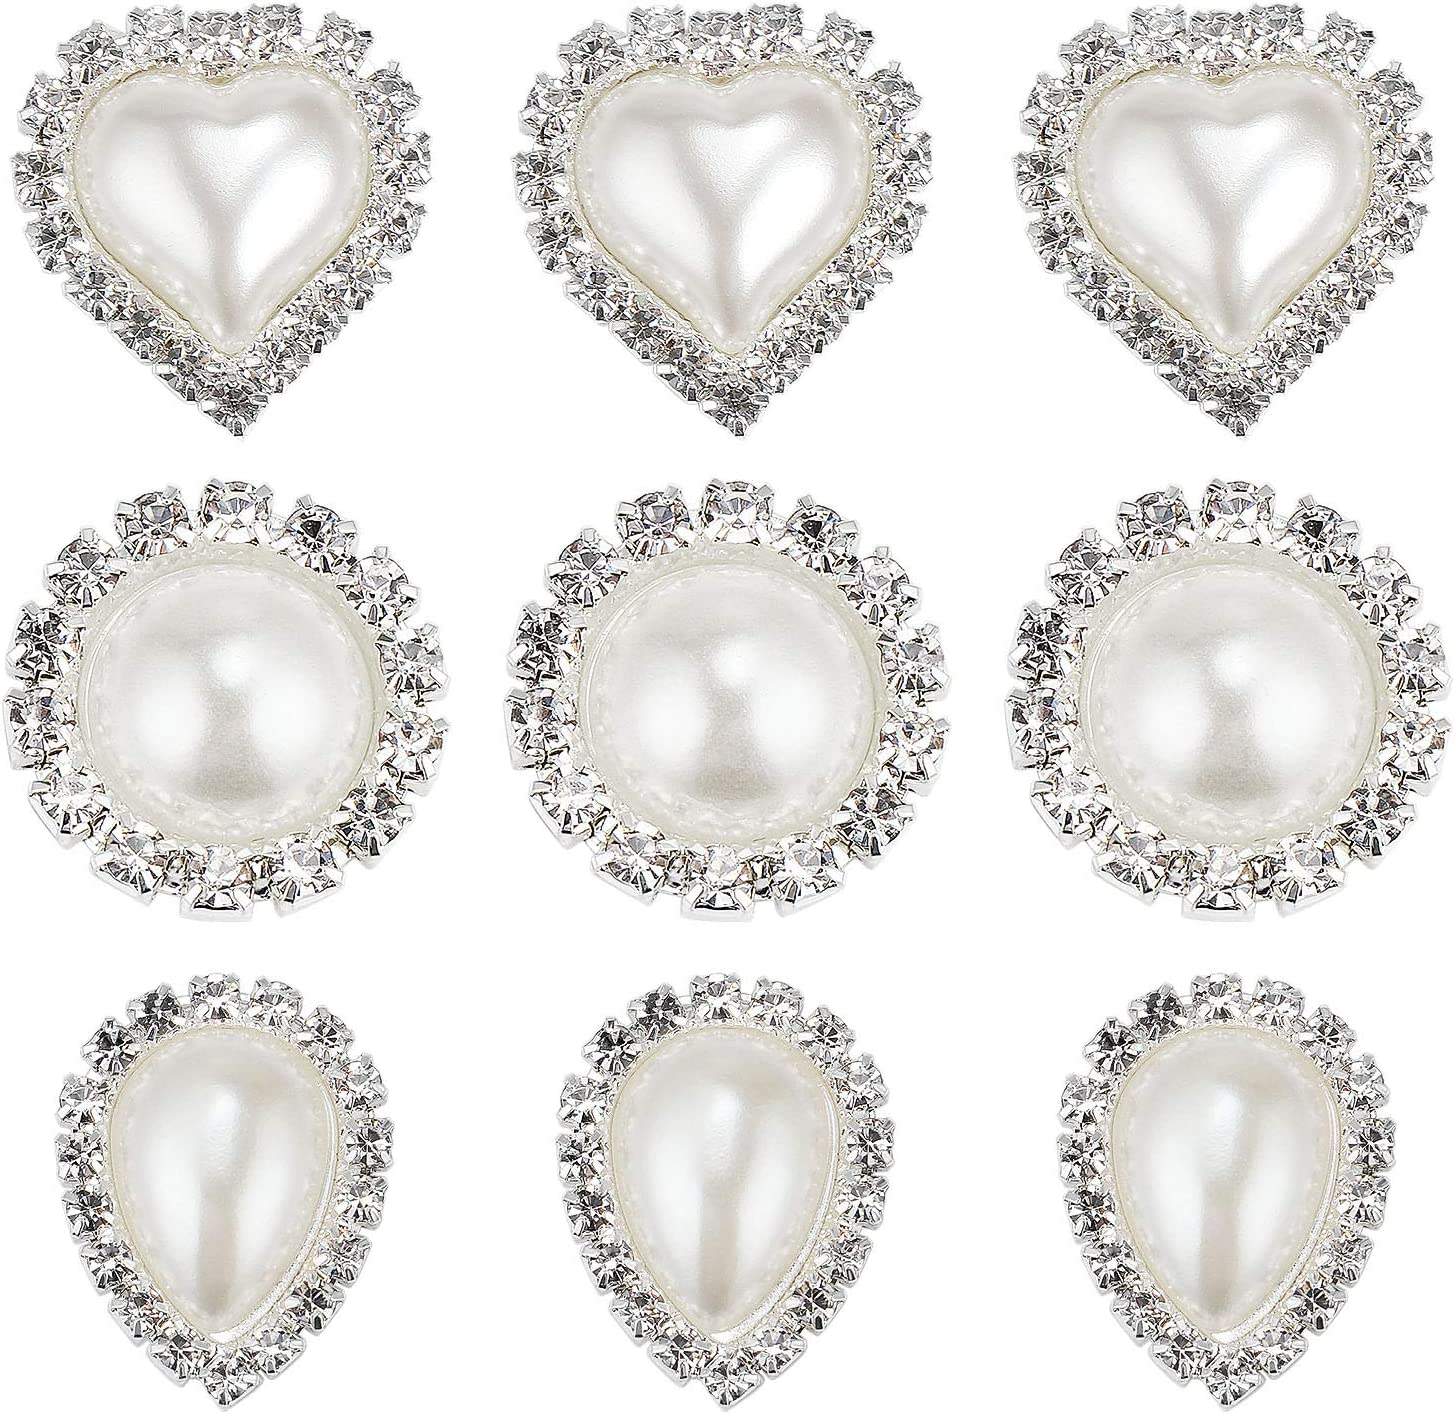 TsunNee 30 botones de perlas de imitación de diamantes de imitación, botones de parte trasera plana, adornos para manualidades, envoltura de regalos de boda